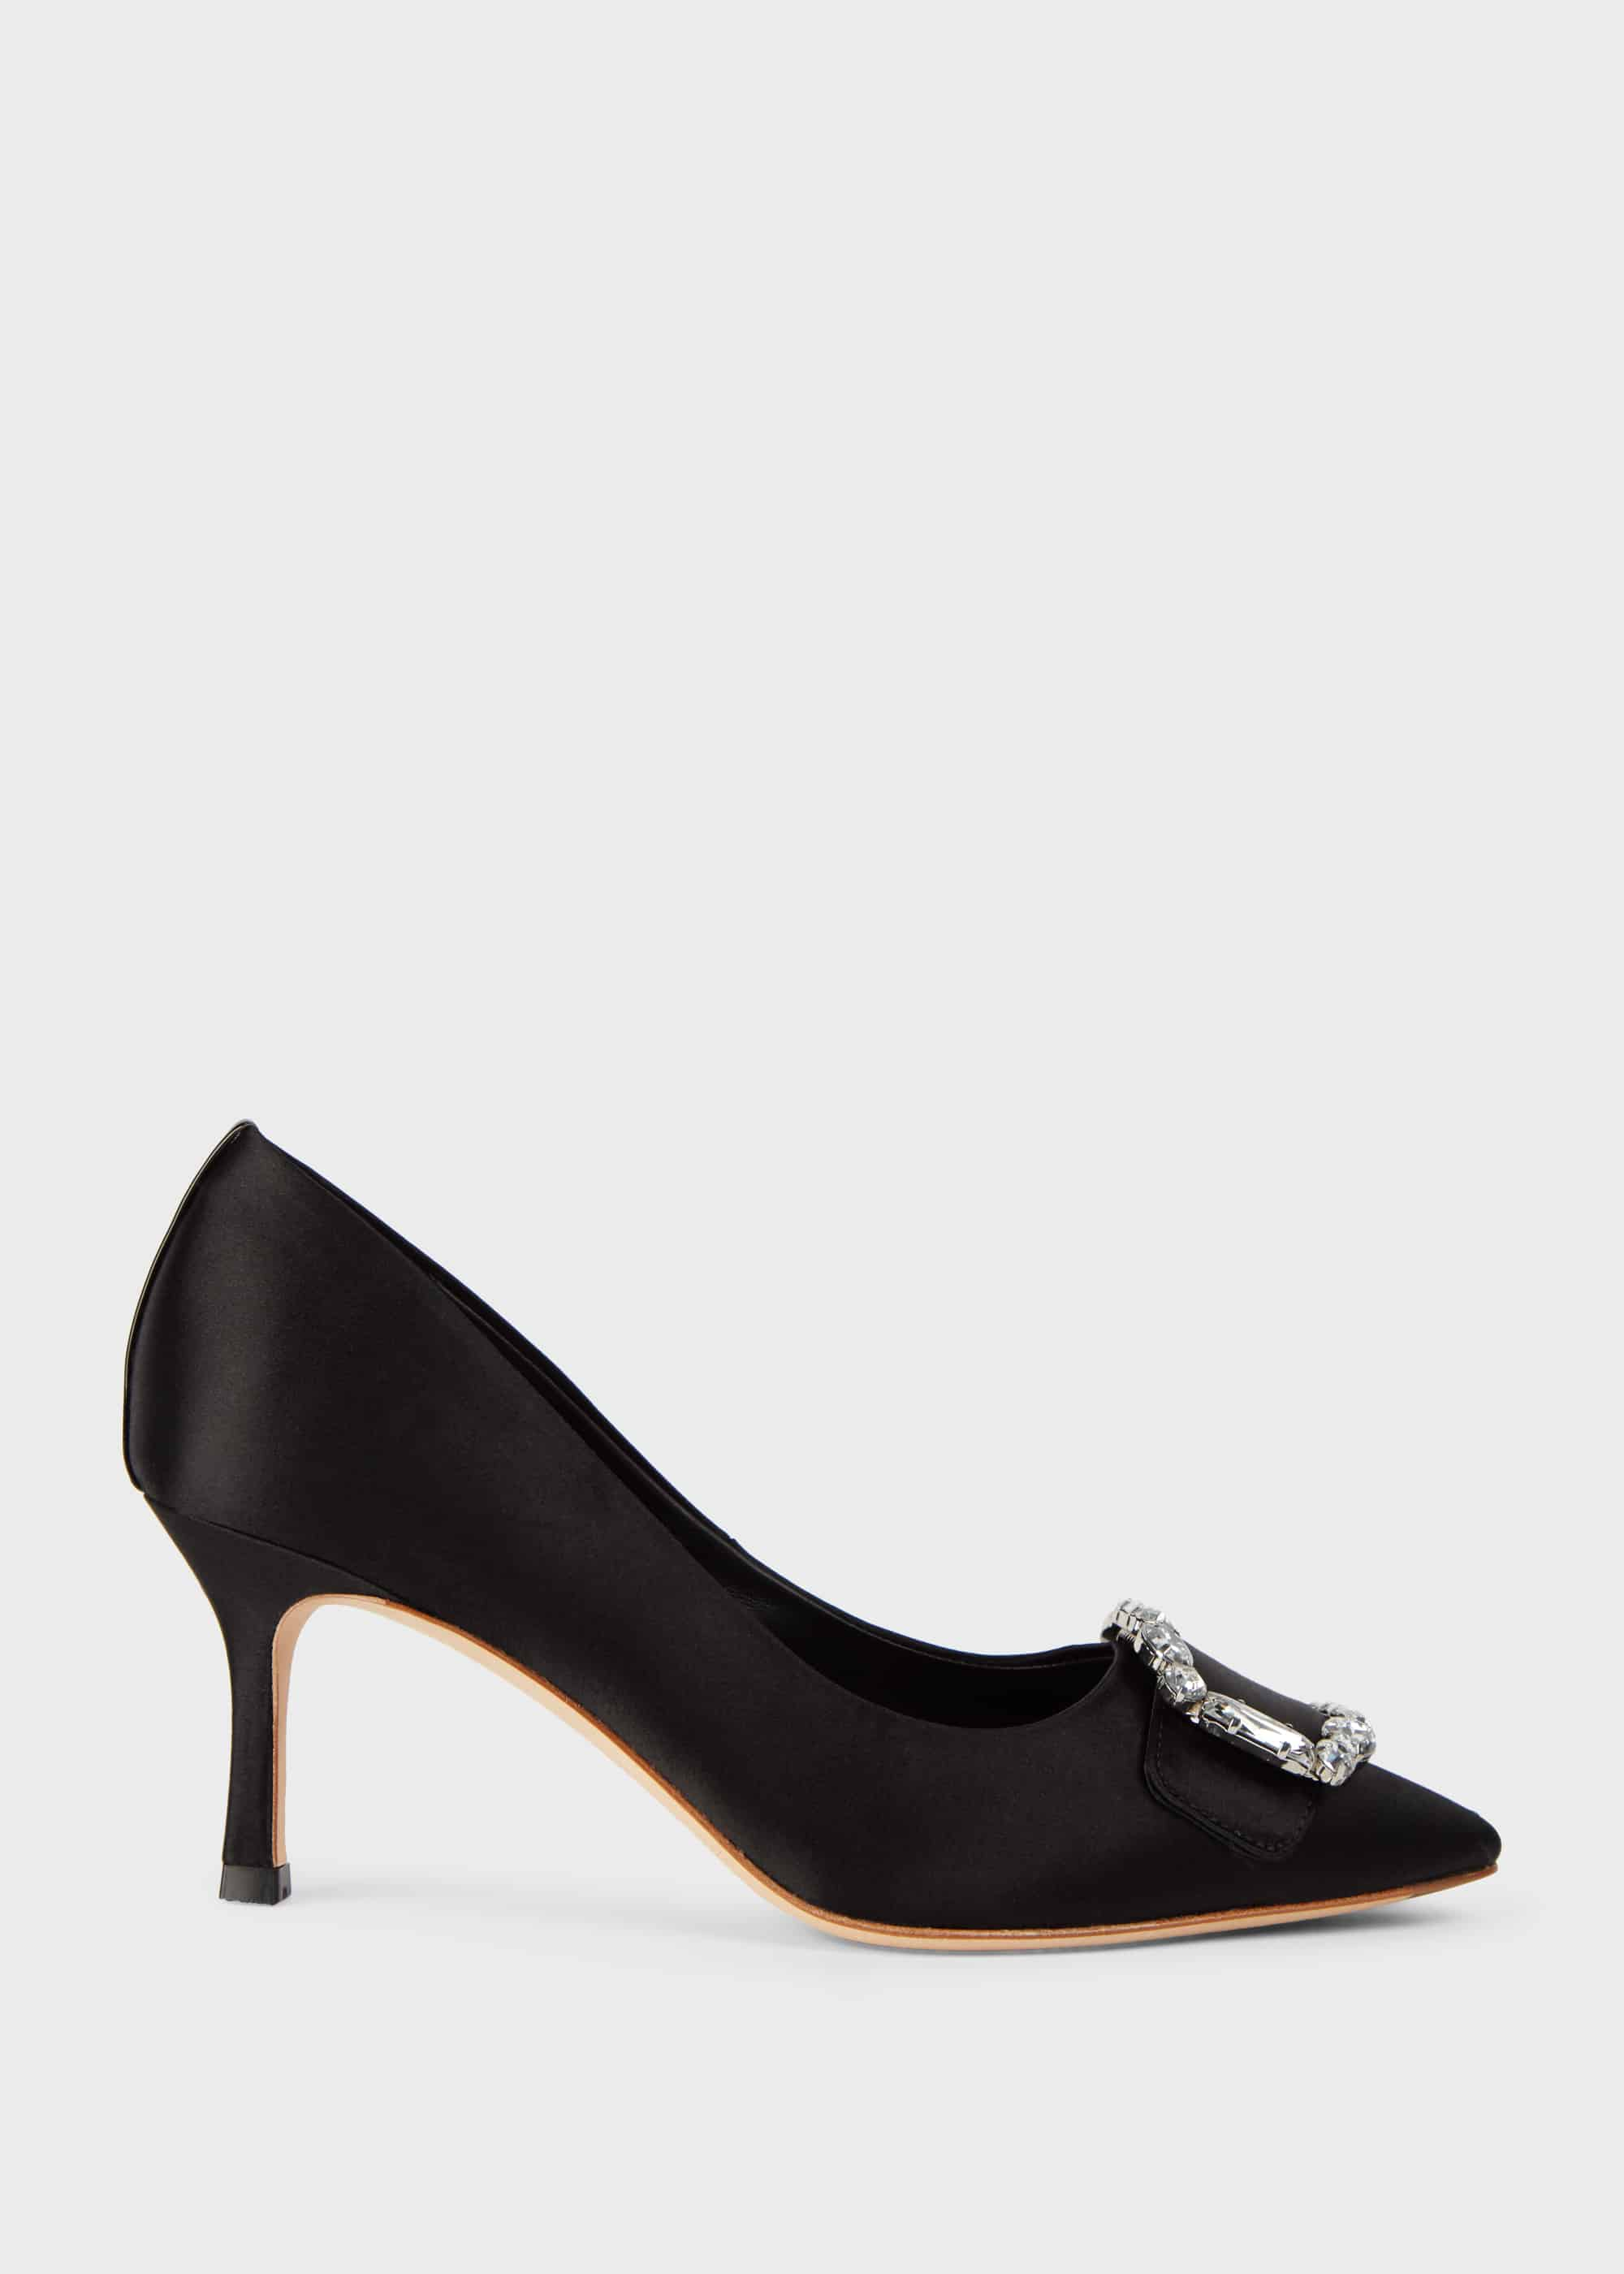 Hobbs Women Lucinda Court Shoes